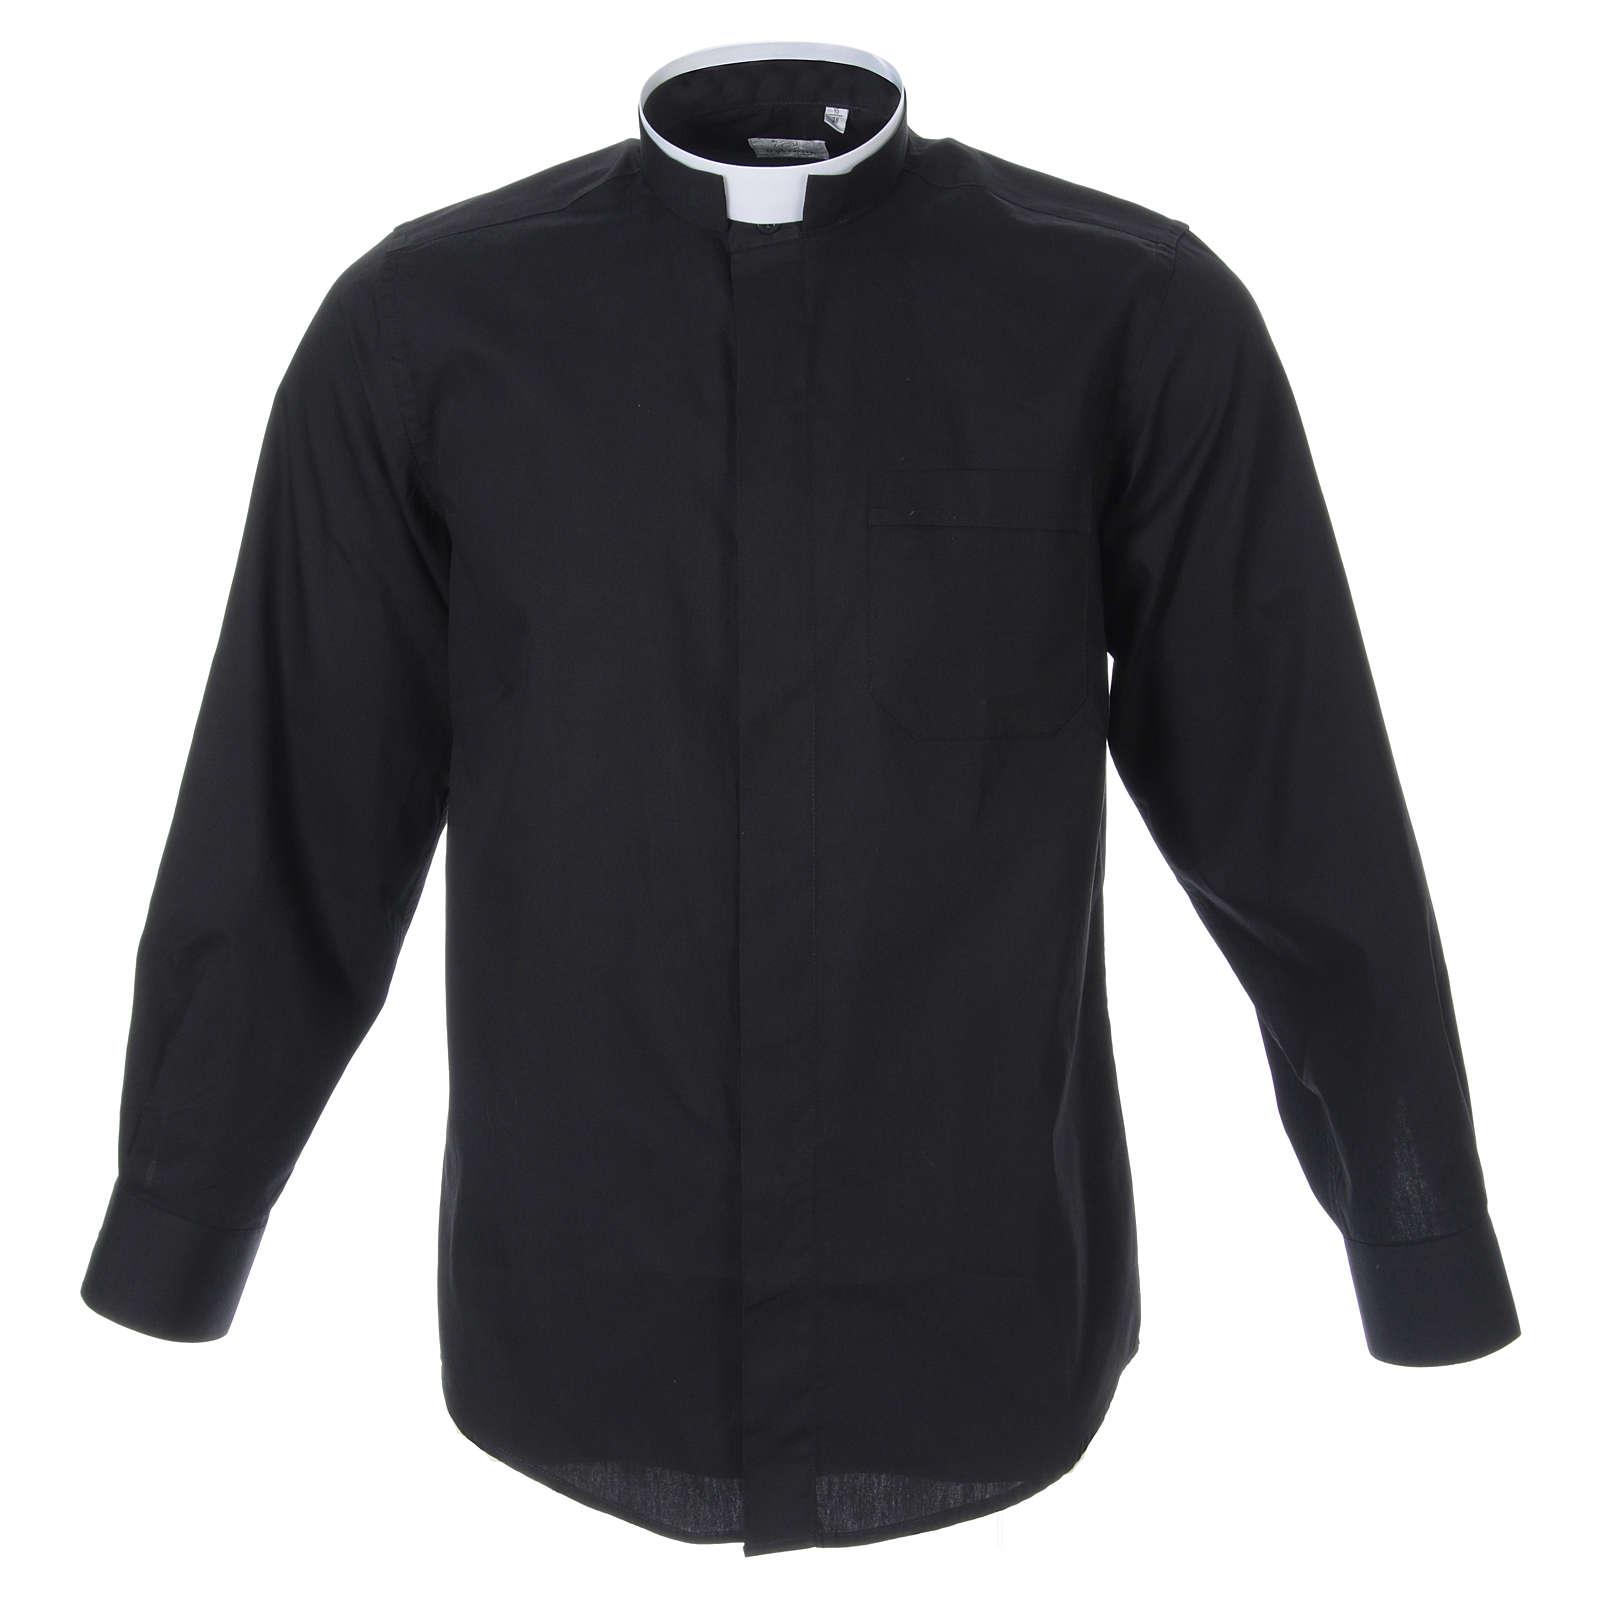 STOCK Clergy shirt, roman collar, long sleeves in black poplin 4